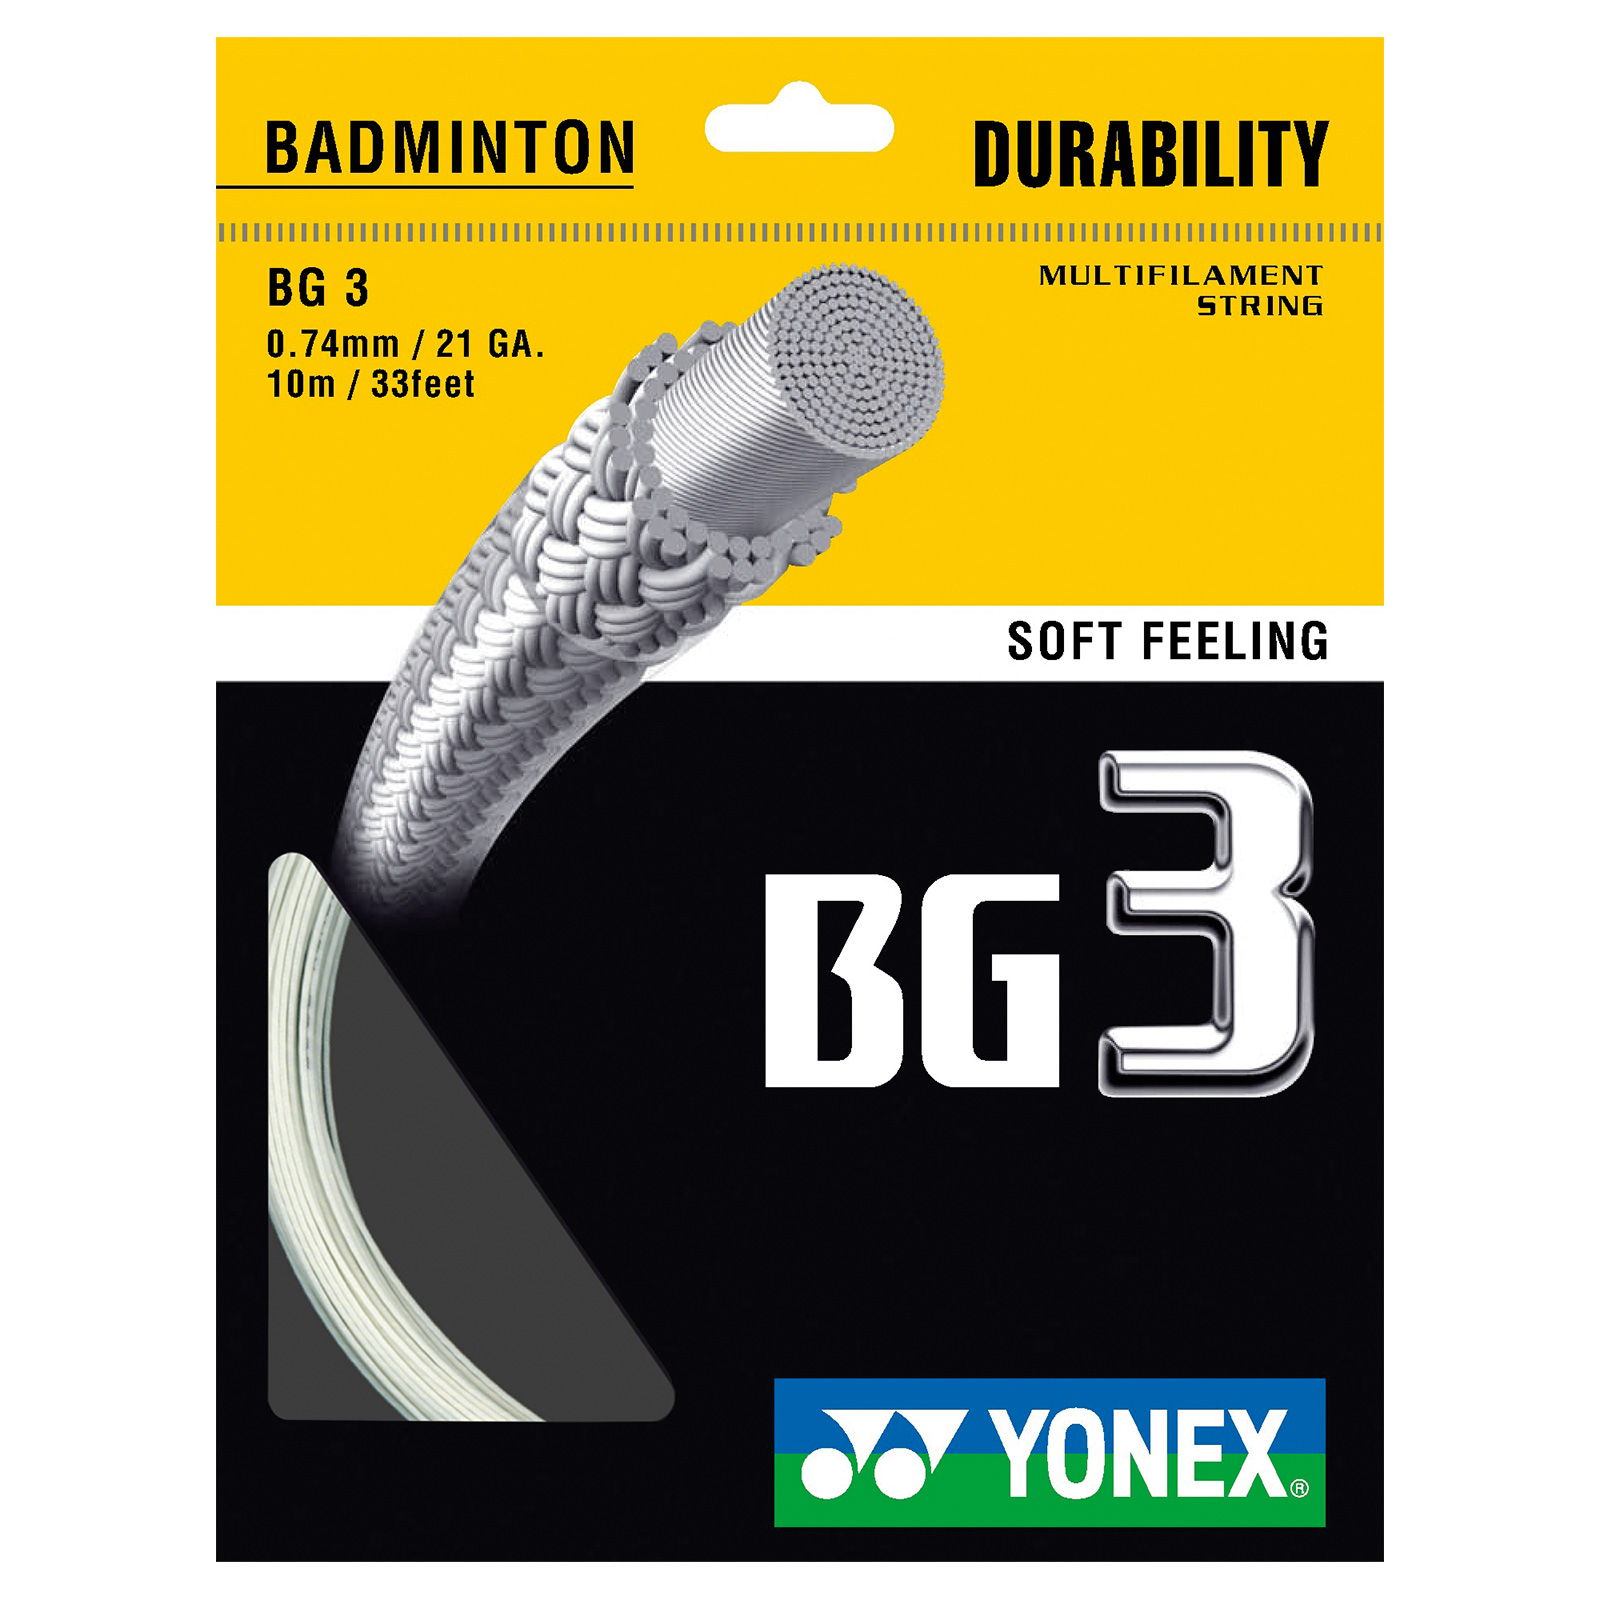 Yonex BG 3 Badminton Racket String - 10m Set